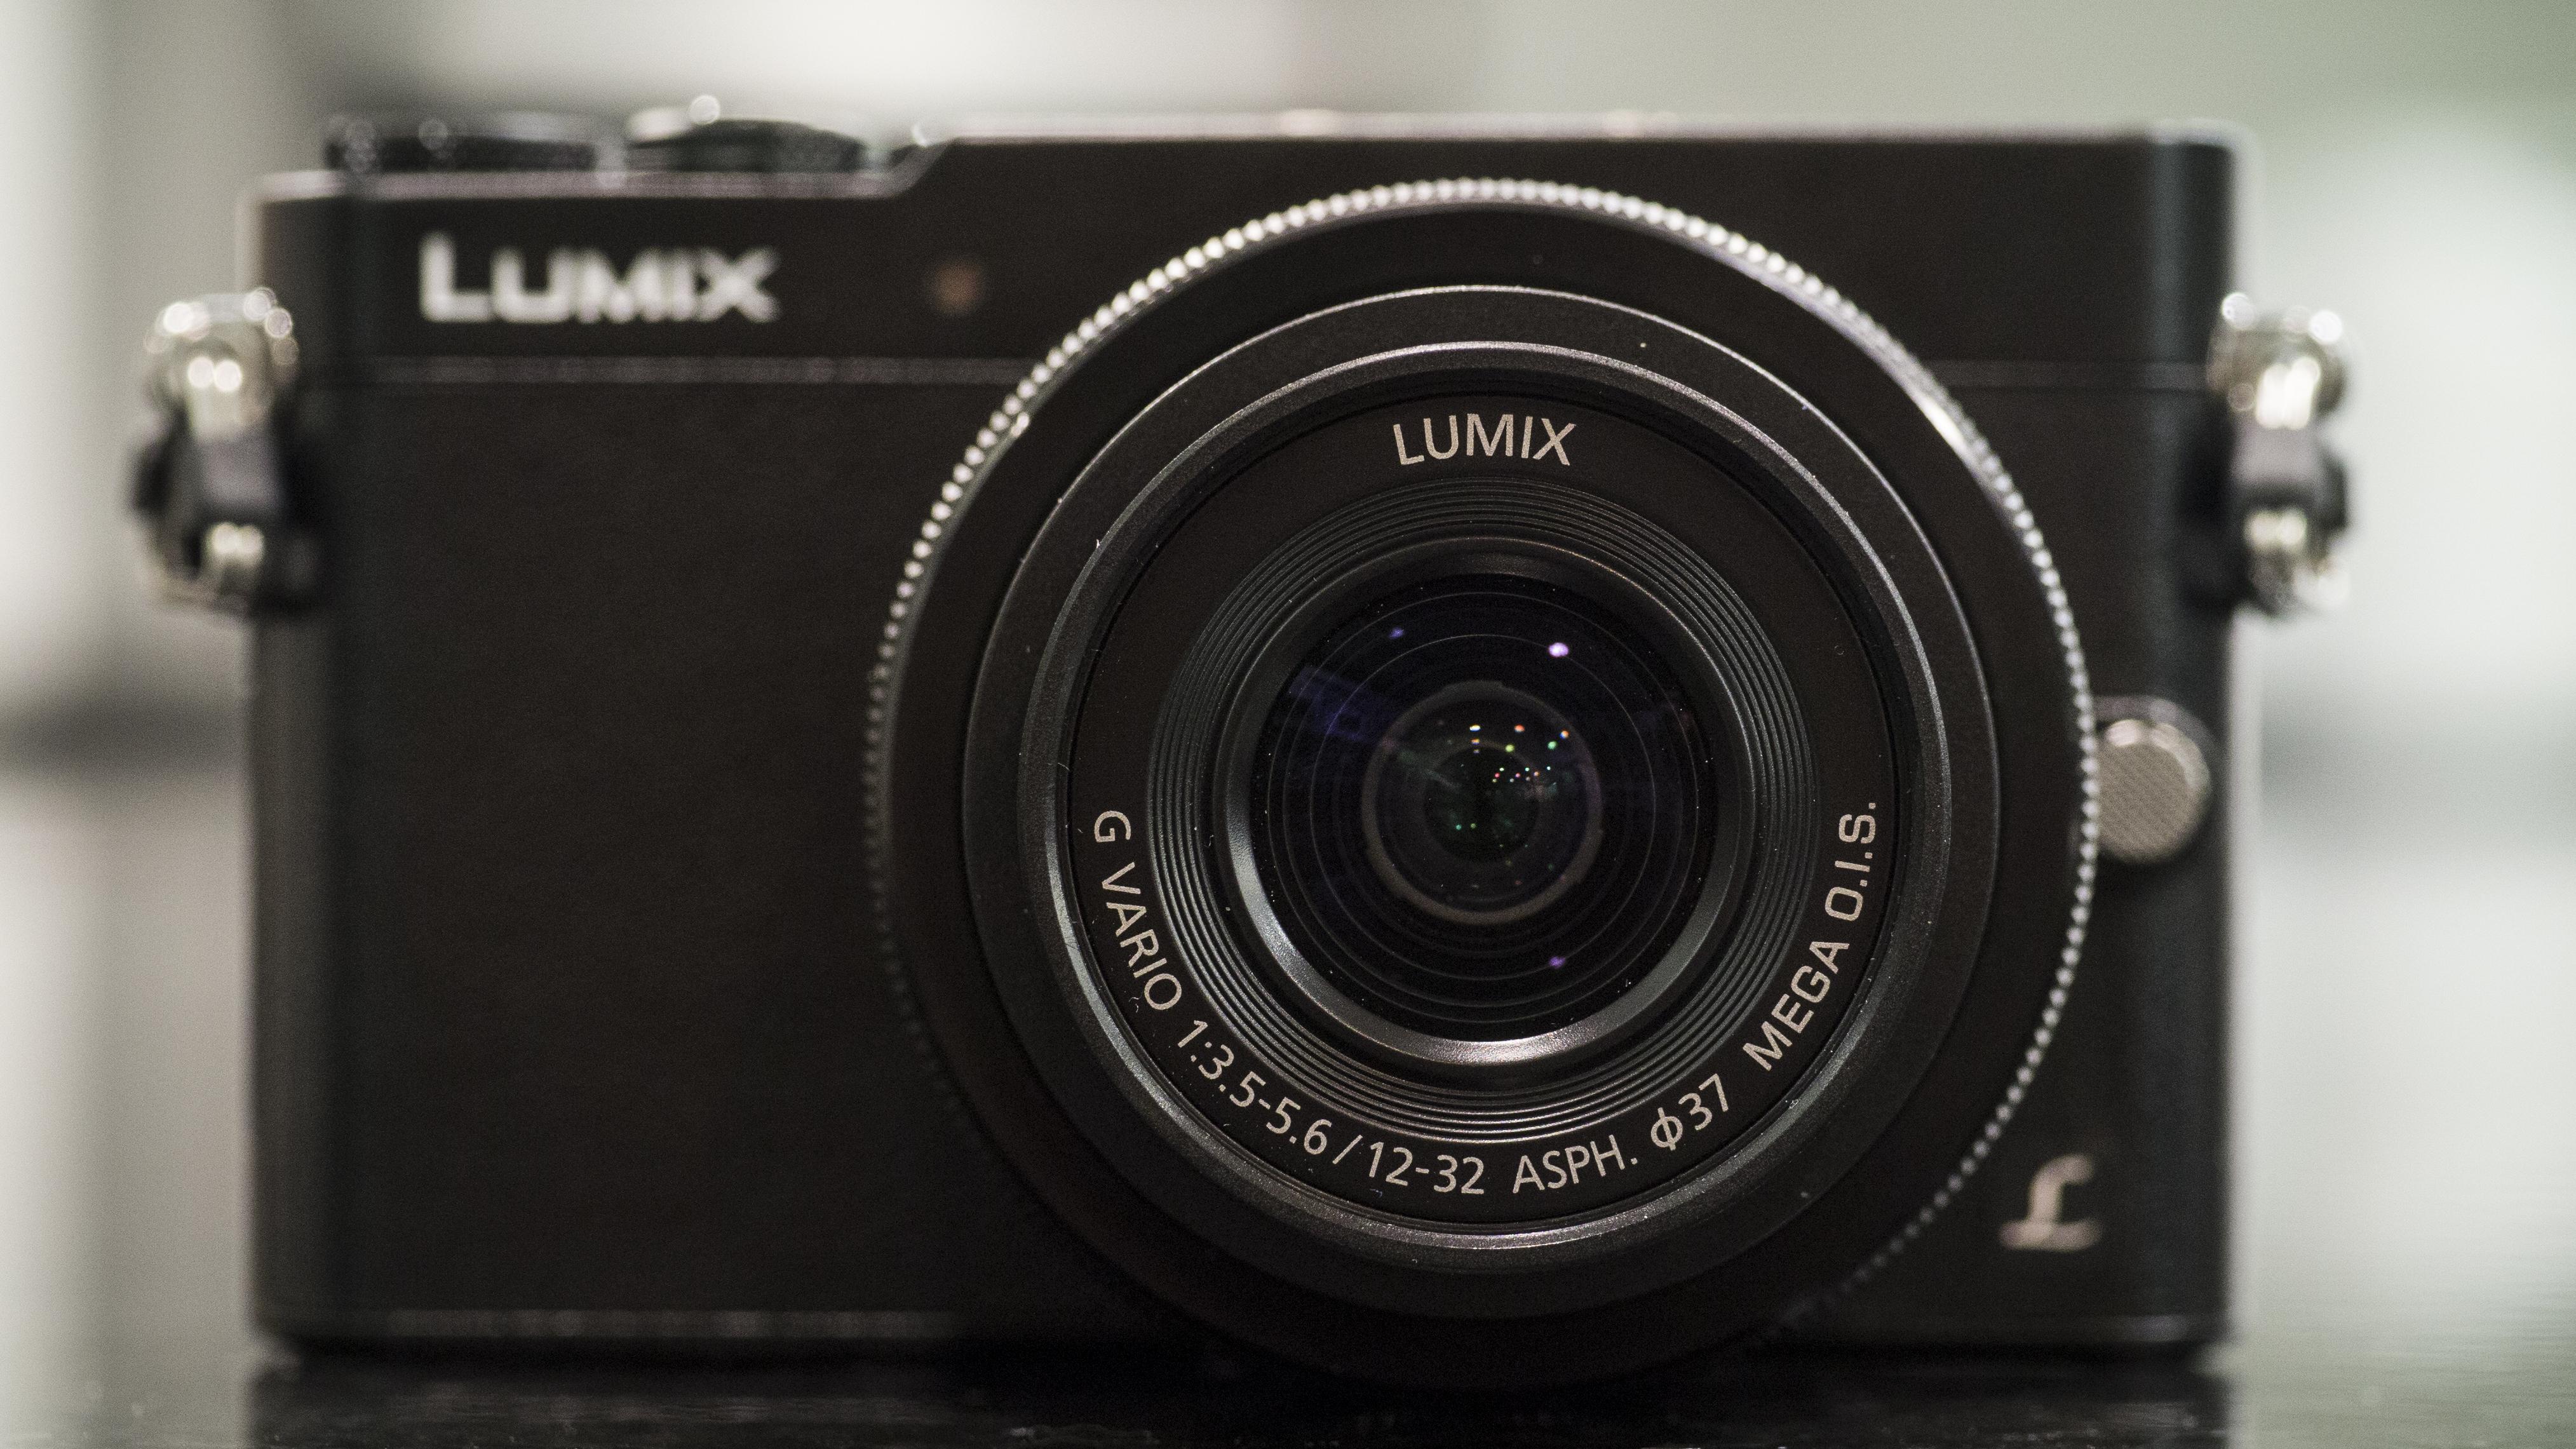 Panasonic Lumix Gm5 Techradar 3 Way Switch